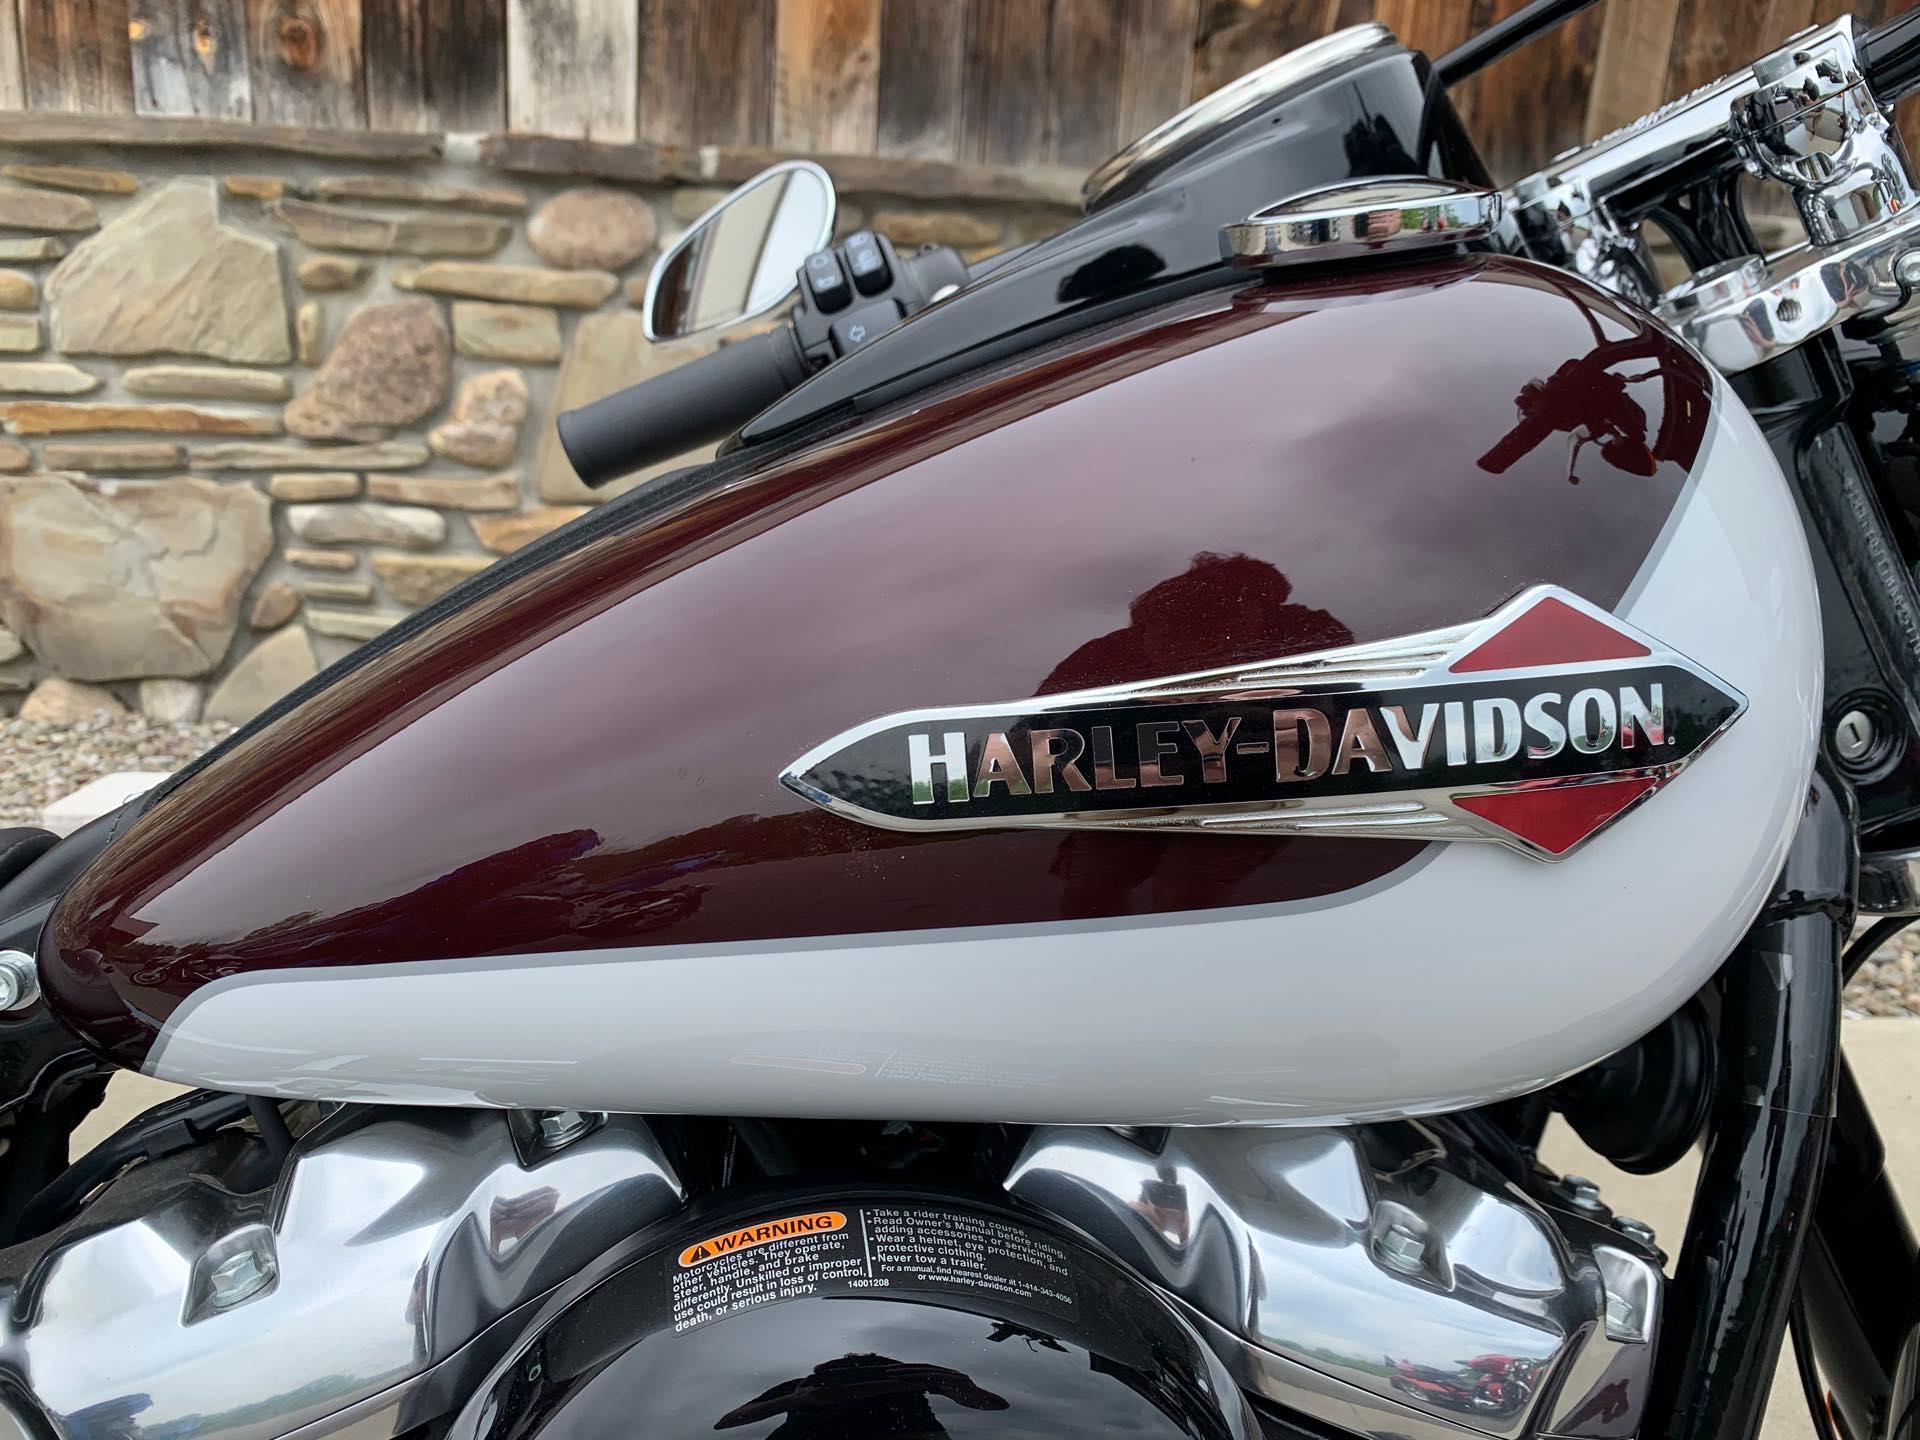 2021 Harley-Davidson FLSL - Softail Slim FLSL Softail Slim at Arkport Cycles